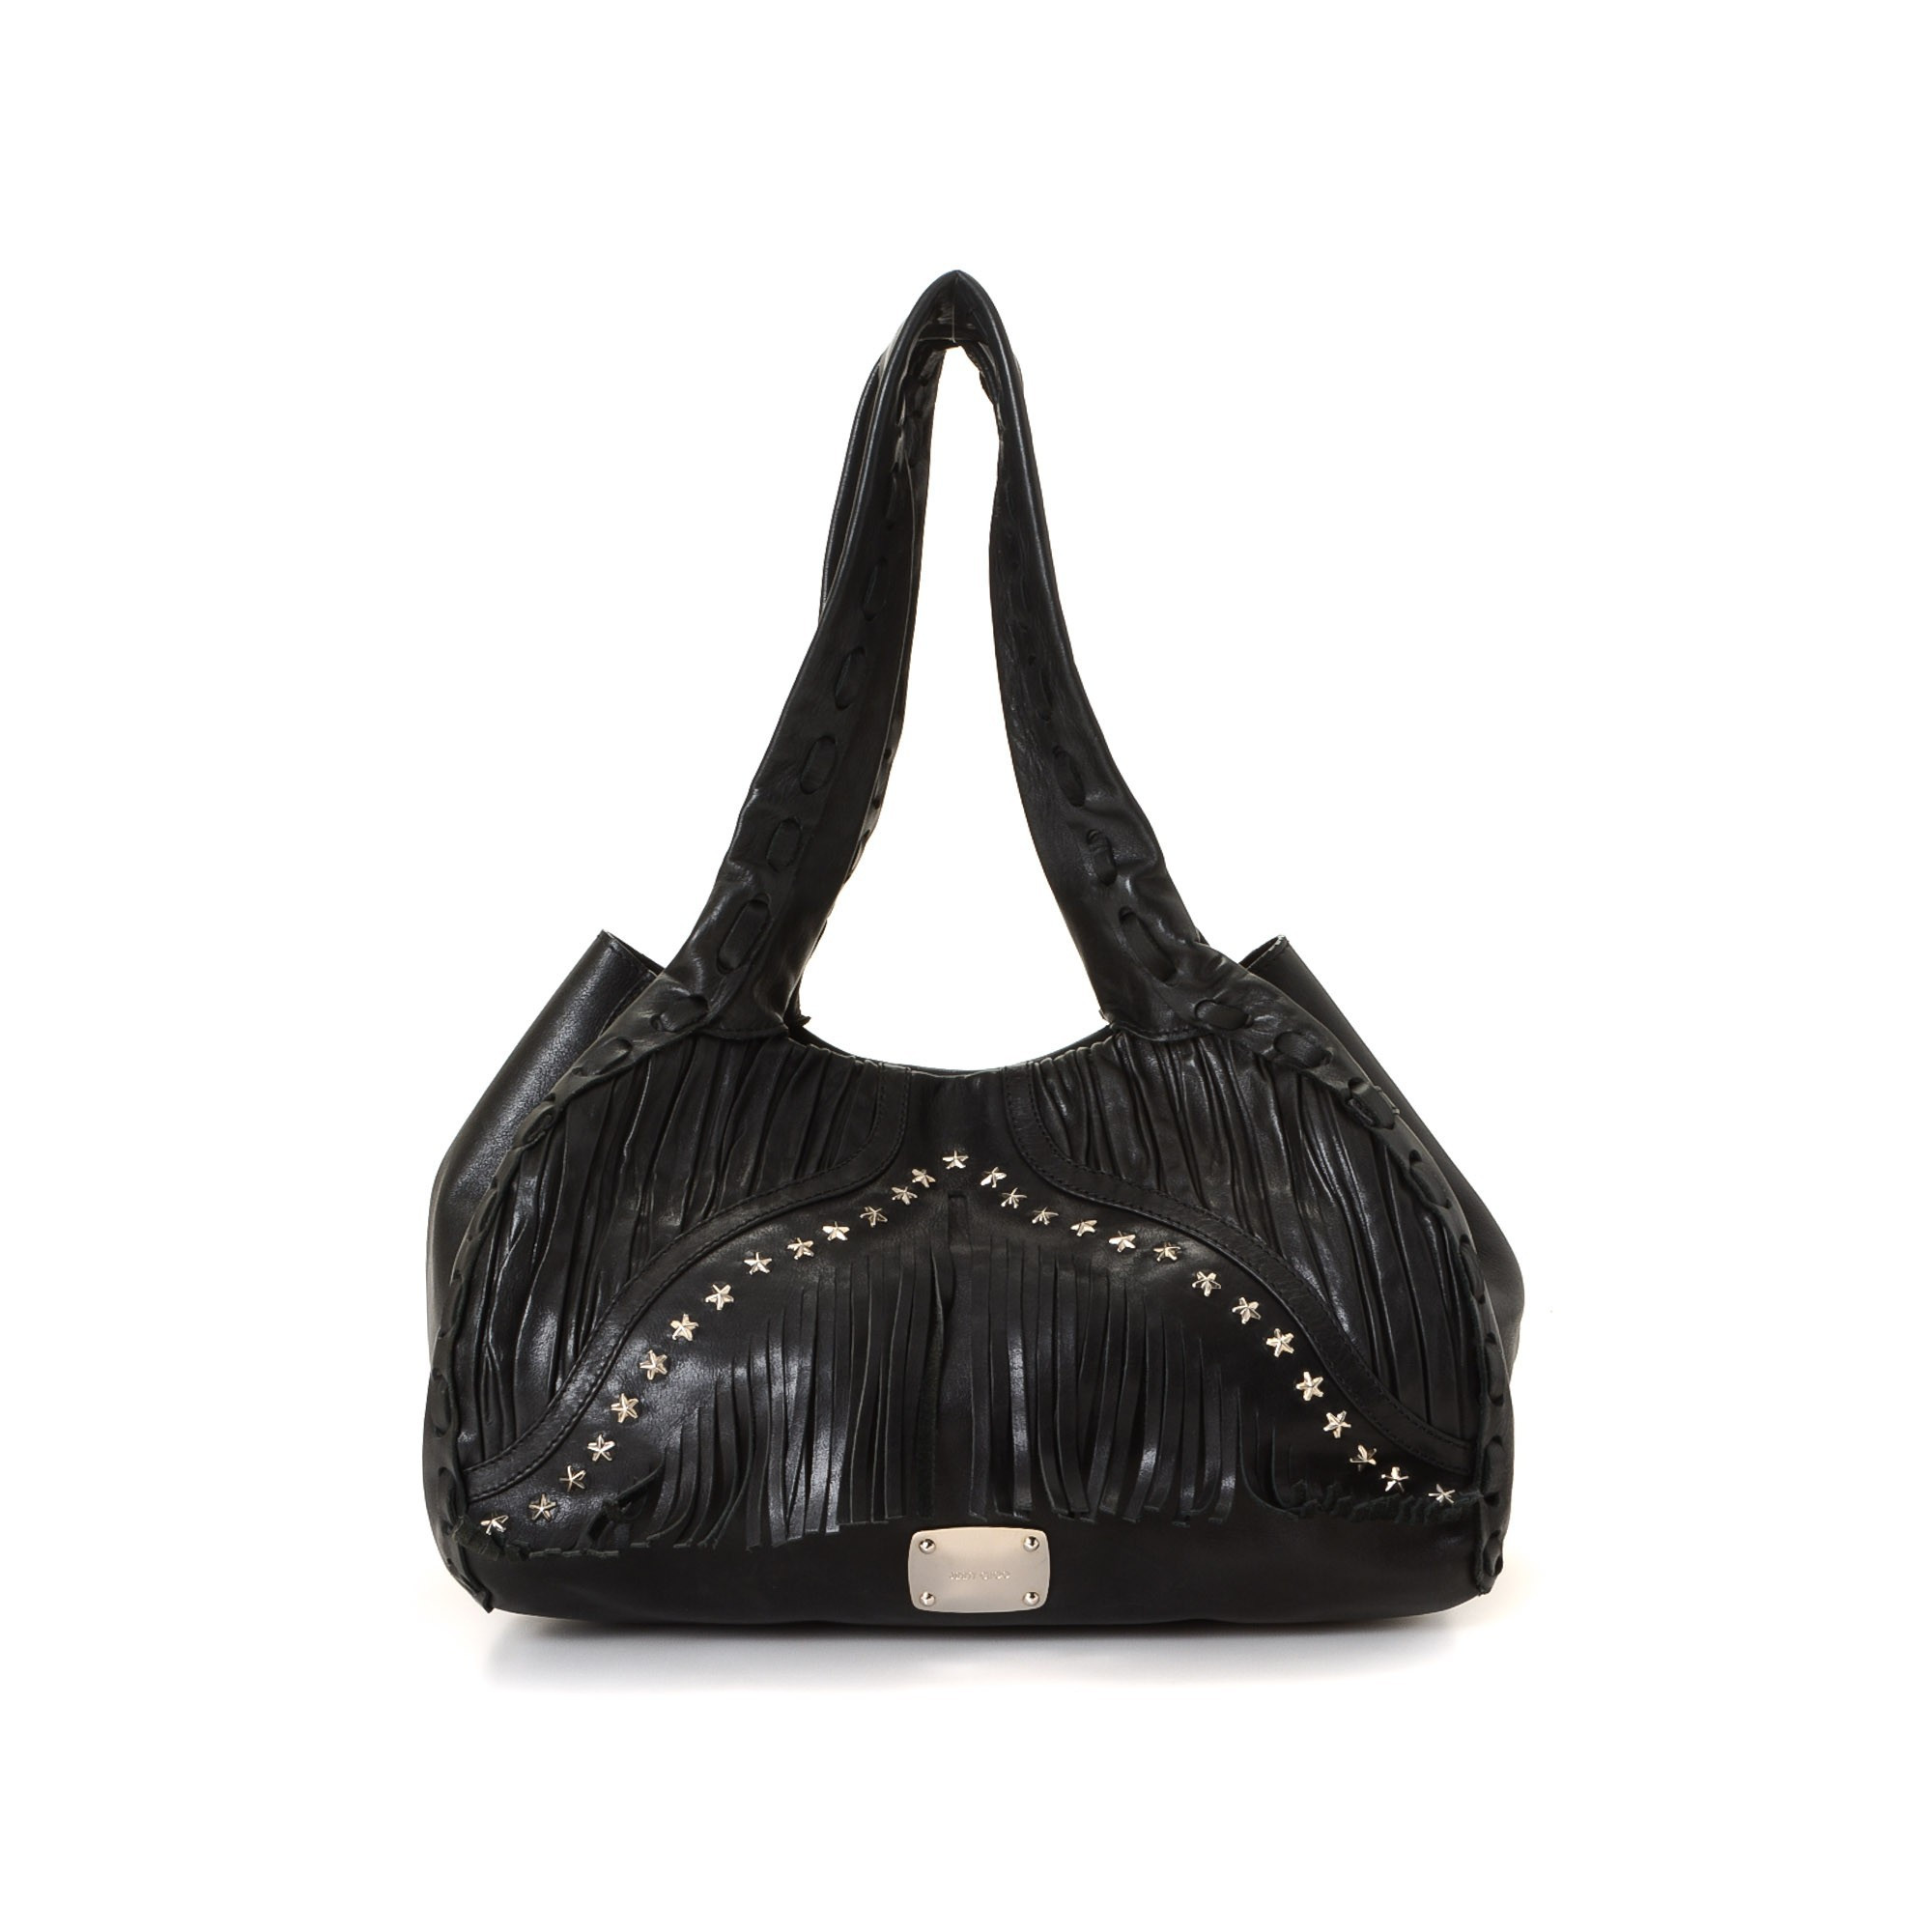 Jimmy Choo Star Hobo Bag Black Leather Shoulder Bag LXRCO